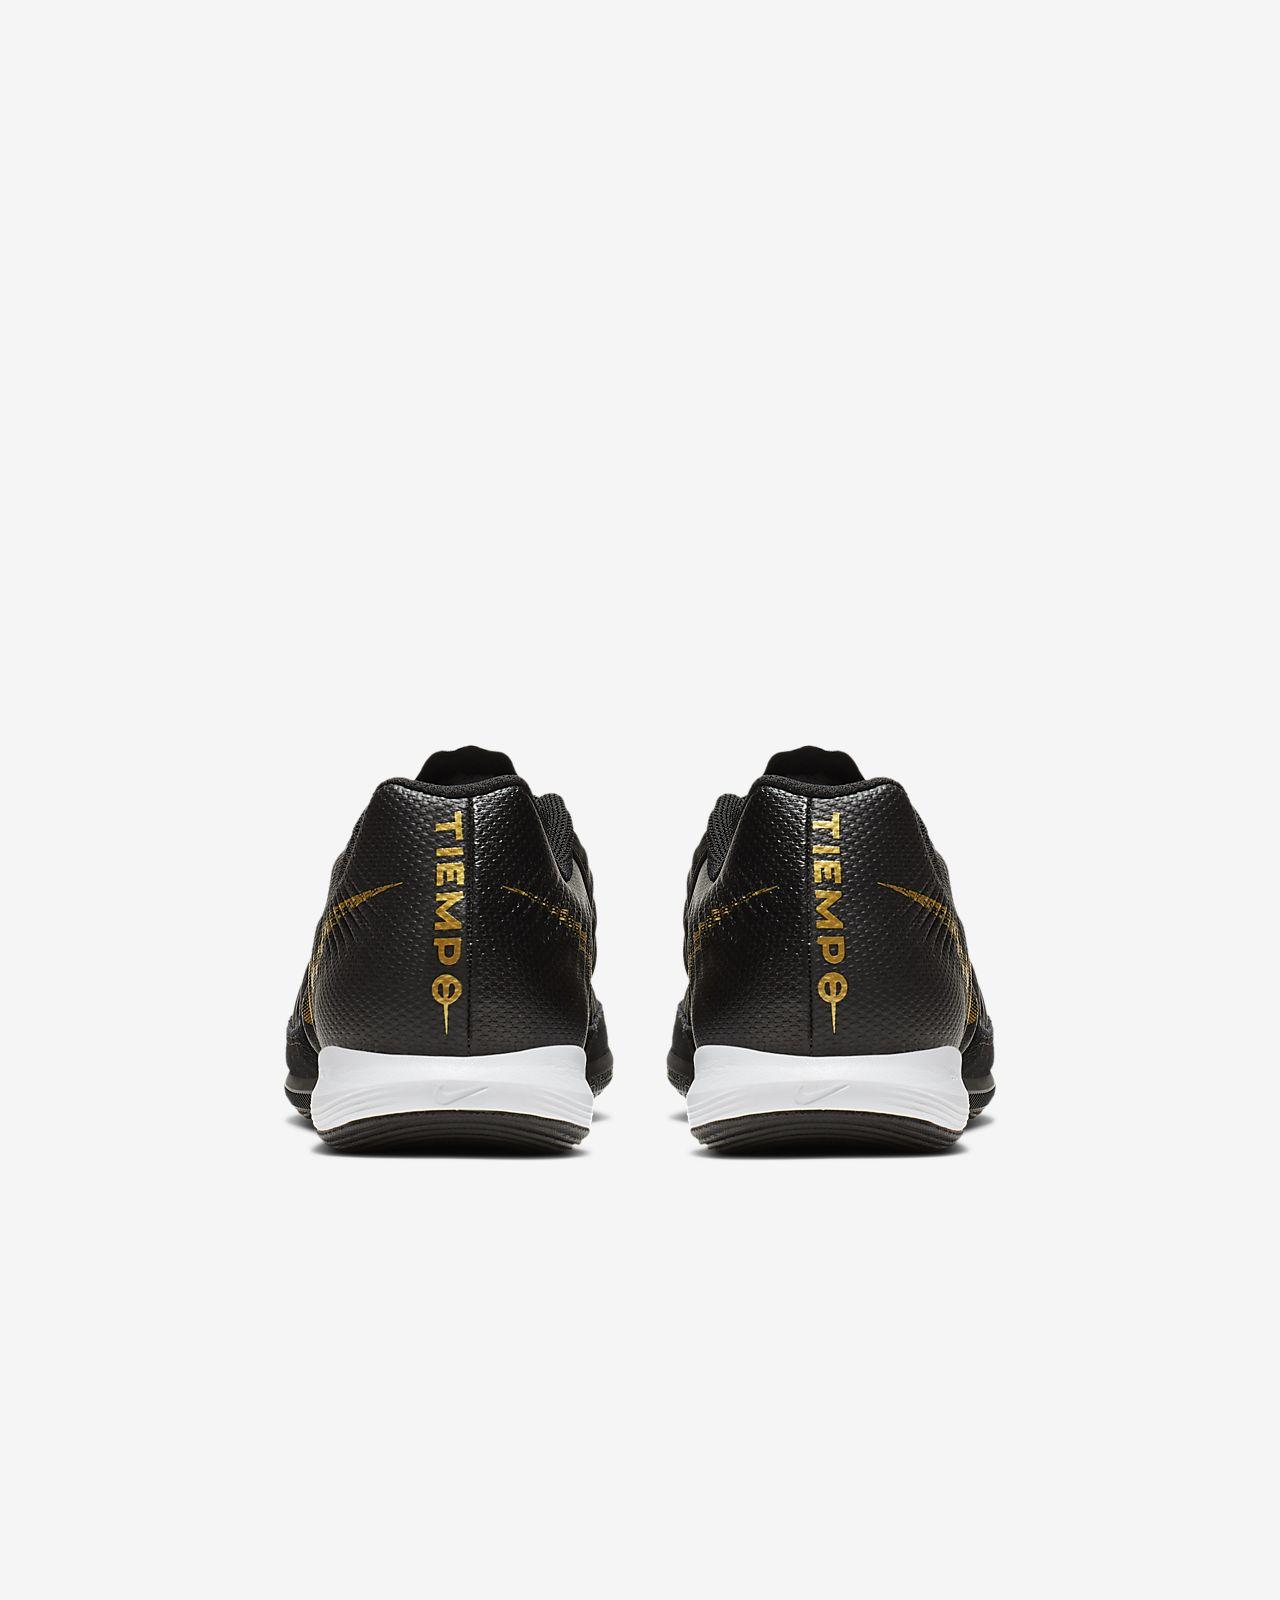 ... Calzado de fútbol para cancha cubierta Nike TiempoX Lunar Legend VII Pro 00cd7a5cc33b9